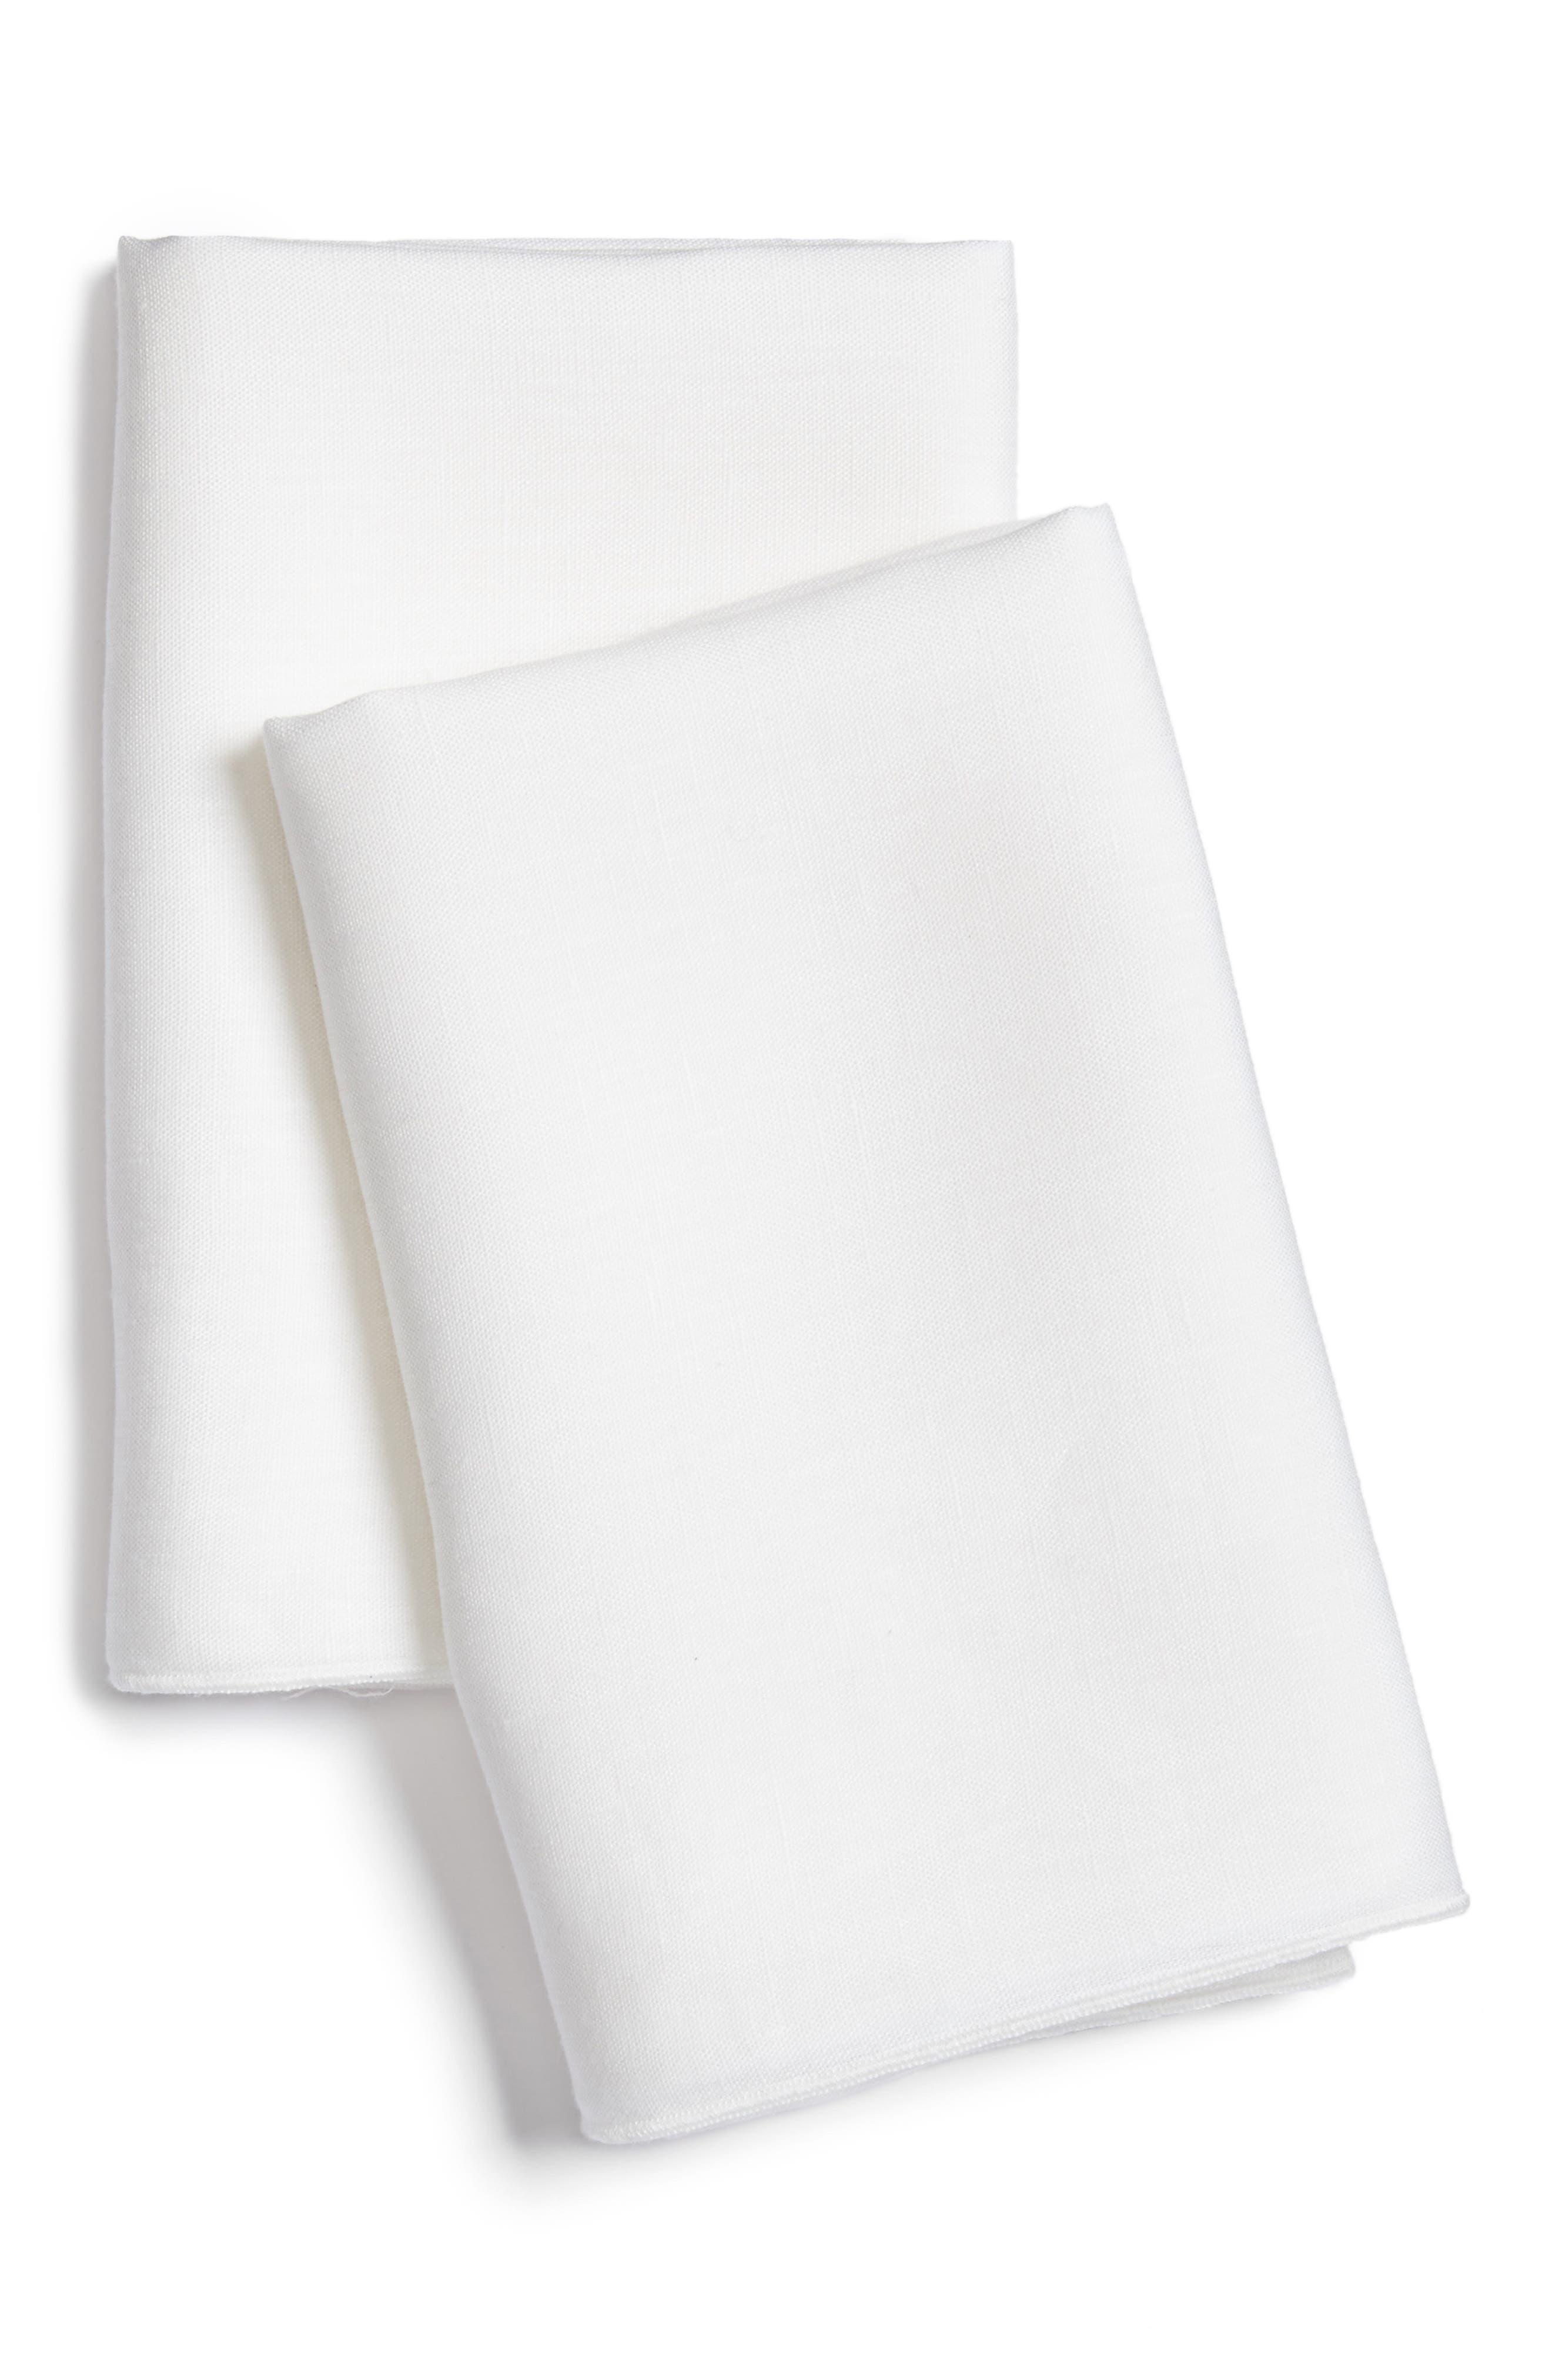 Solo Linen Pillowcases,                         Main,                         color, White